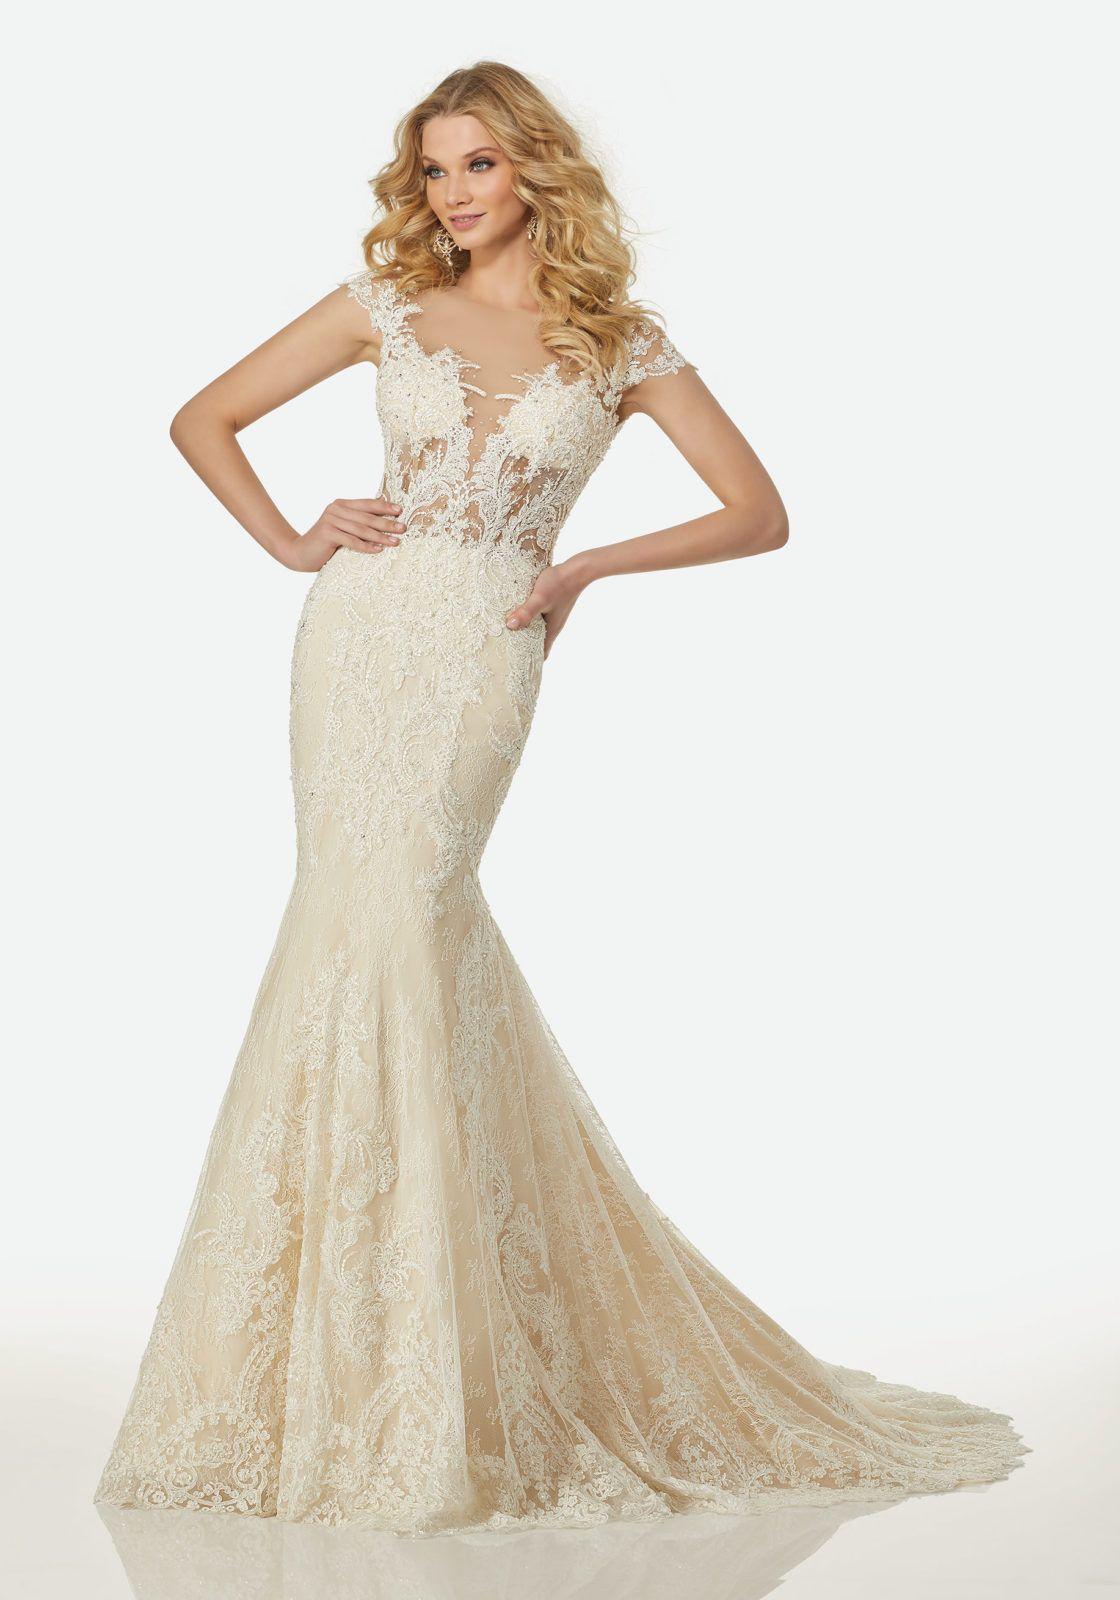 Jasmine Wedding Dress | Randy Fenoli Bridal | Weddings | Pinterest